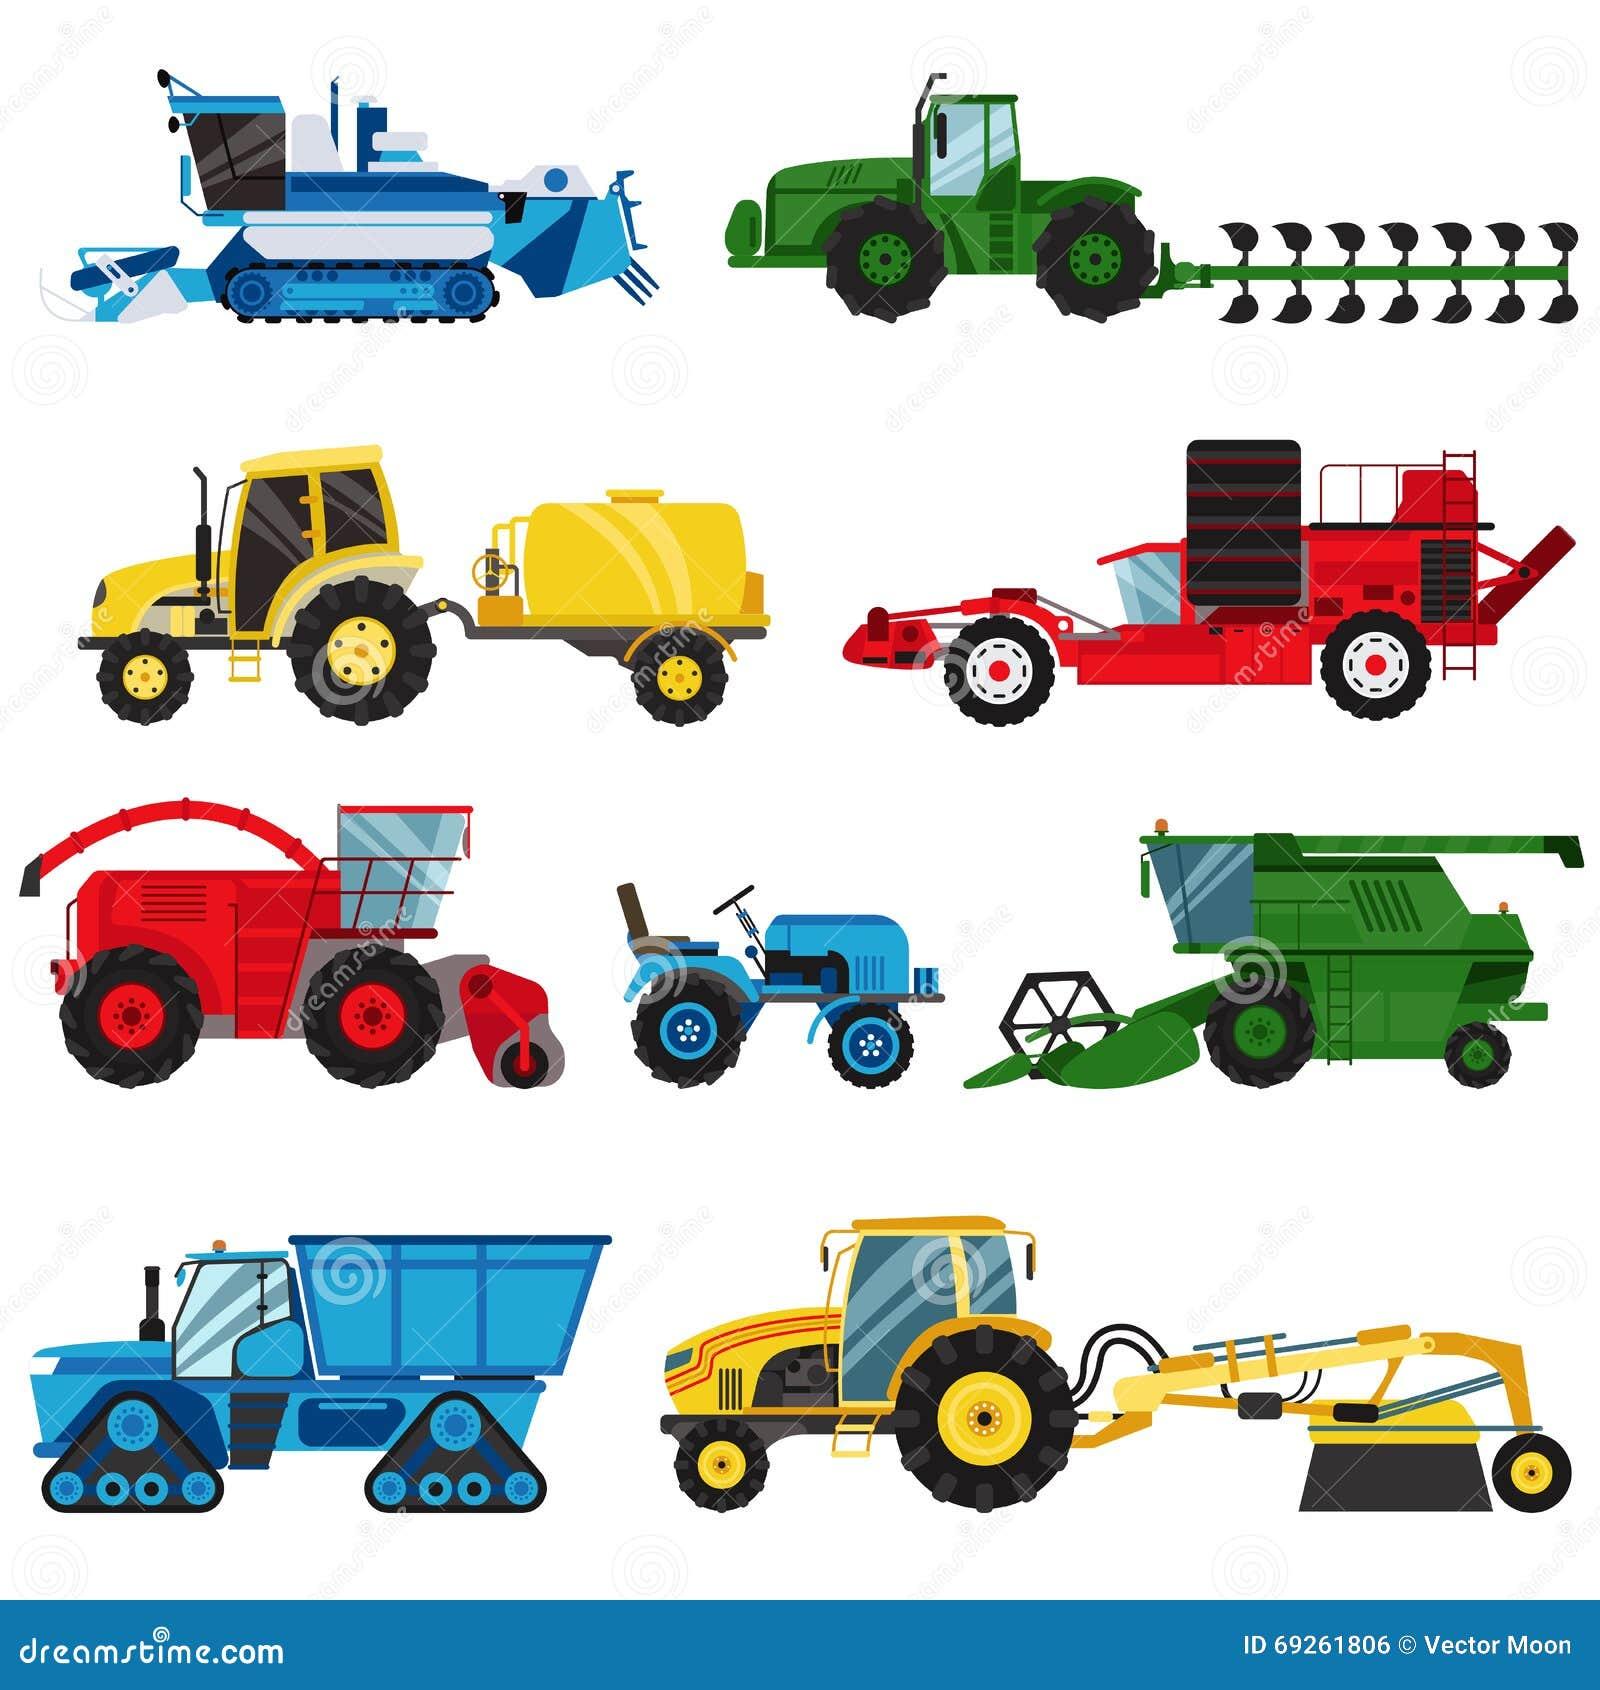 Farm Equipment Clip Art : Equipment farm for agriculture machinery combine harvester